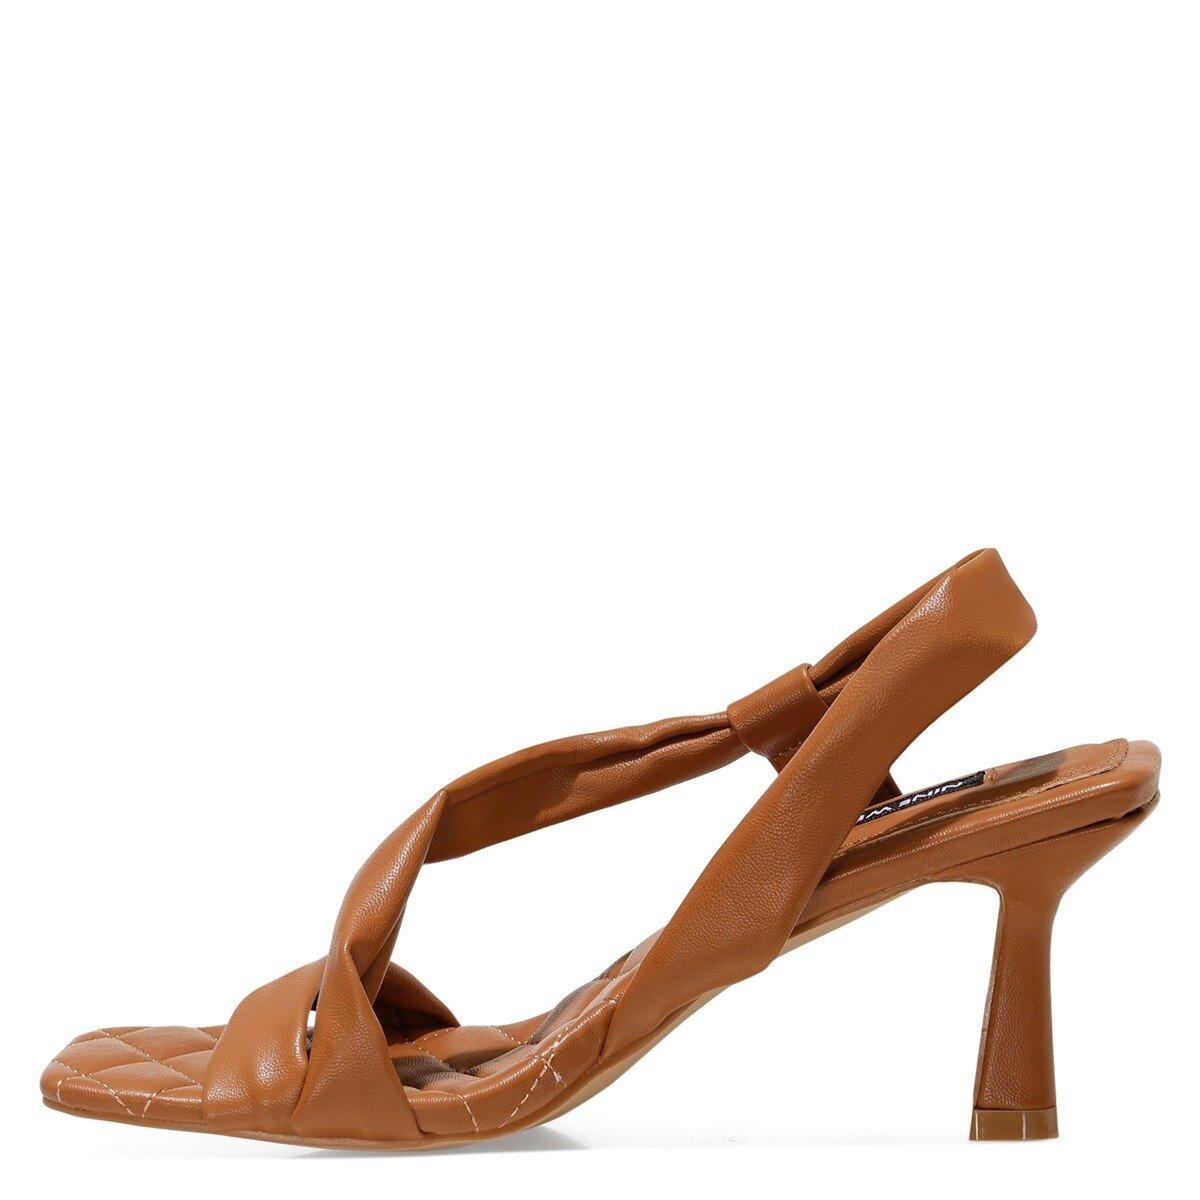 PALMER 1 FX Naturel Kadın Sandalet